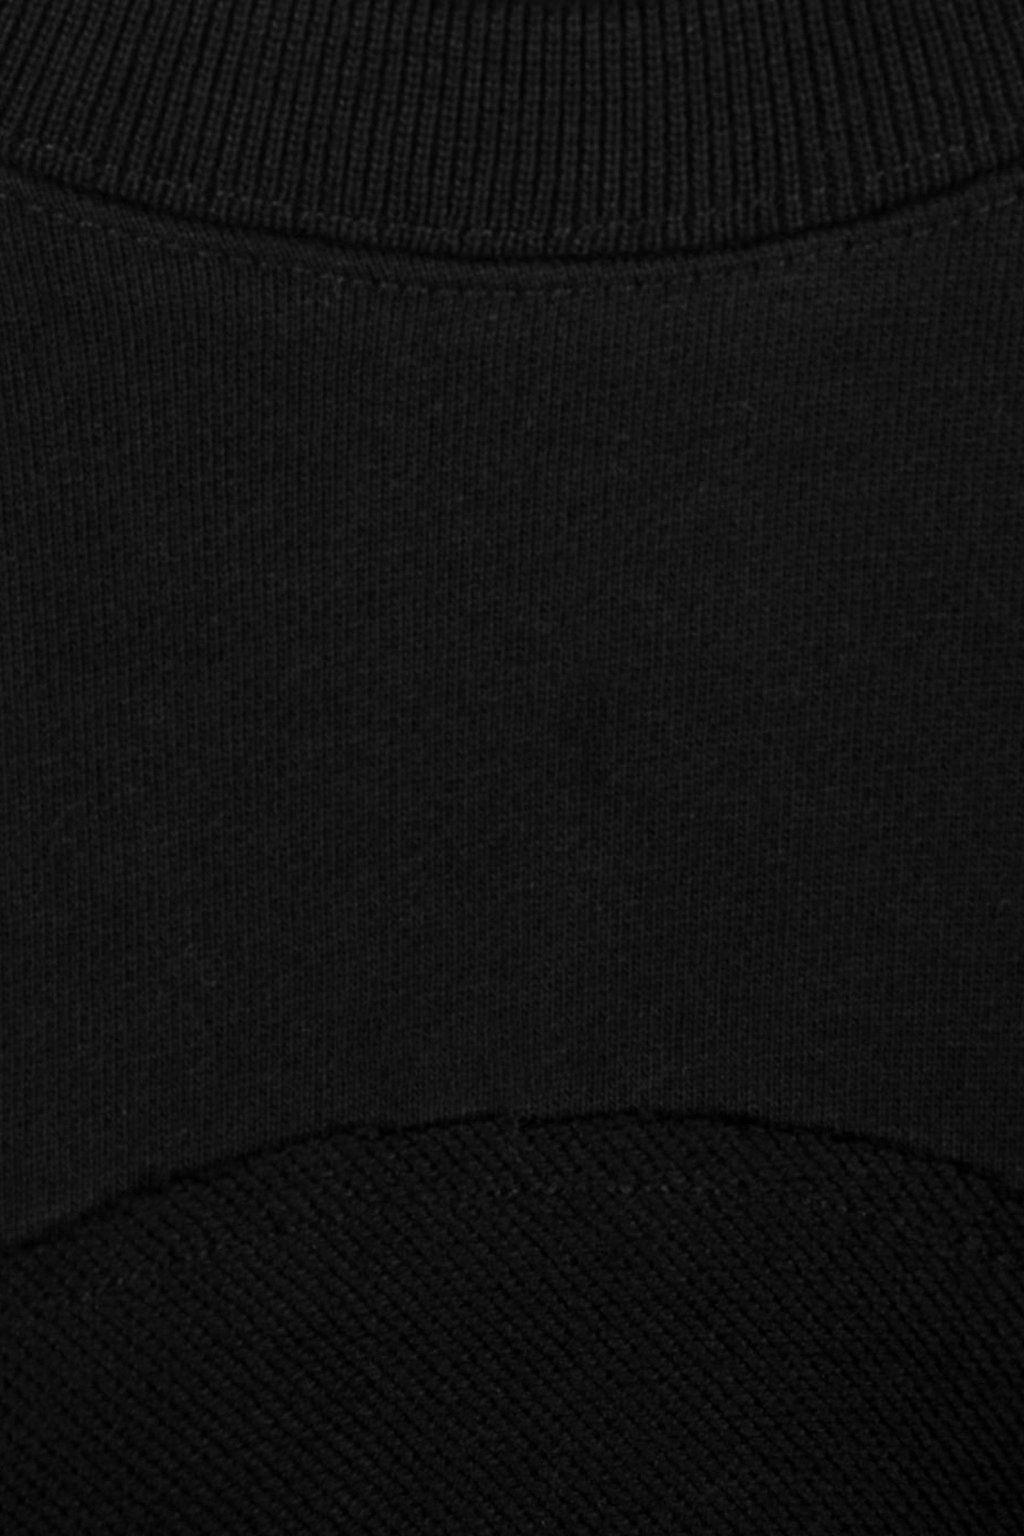 Sweatshirt 1521 Black 10